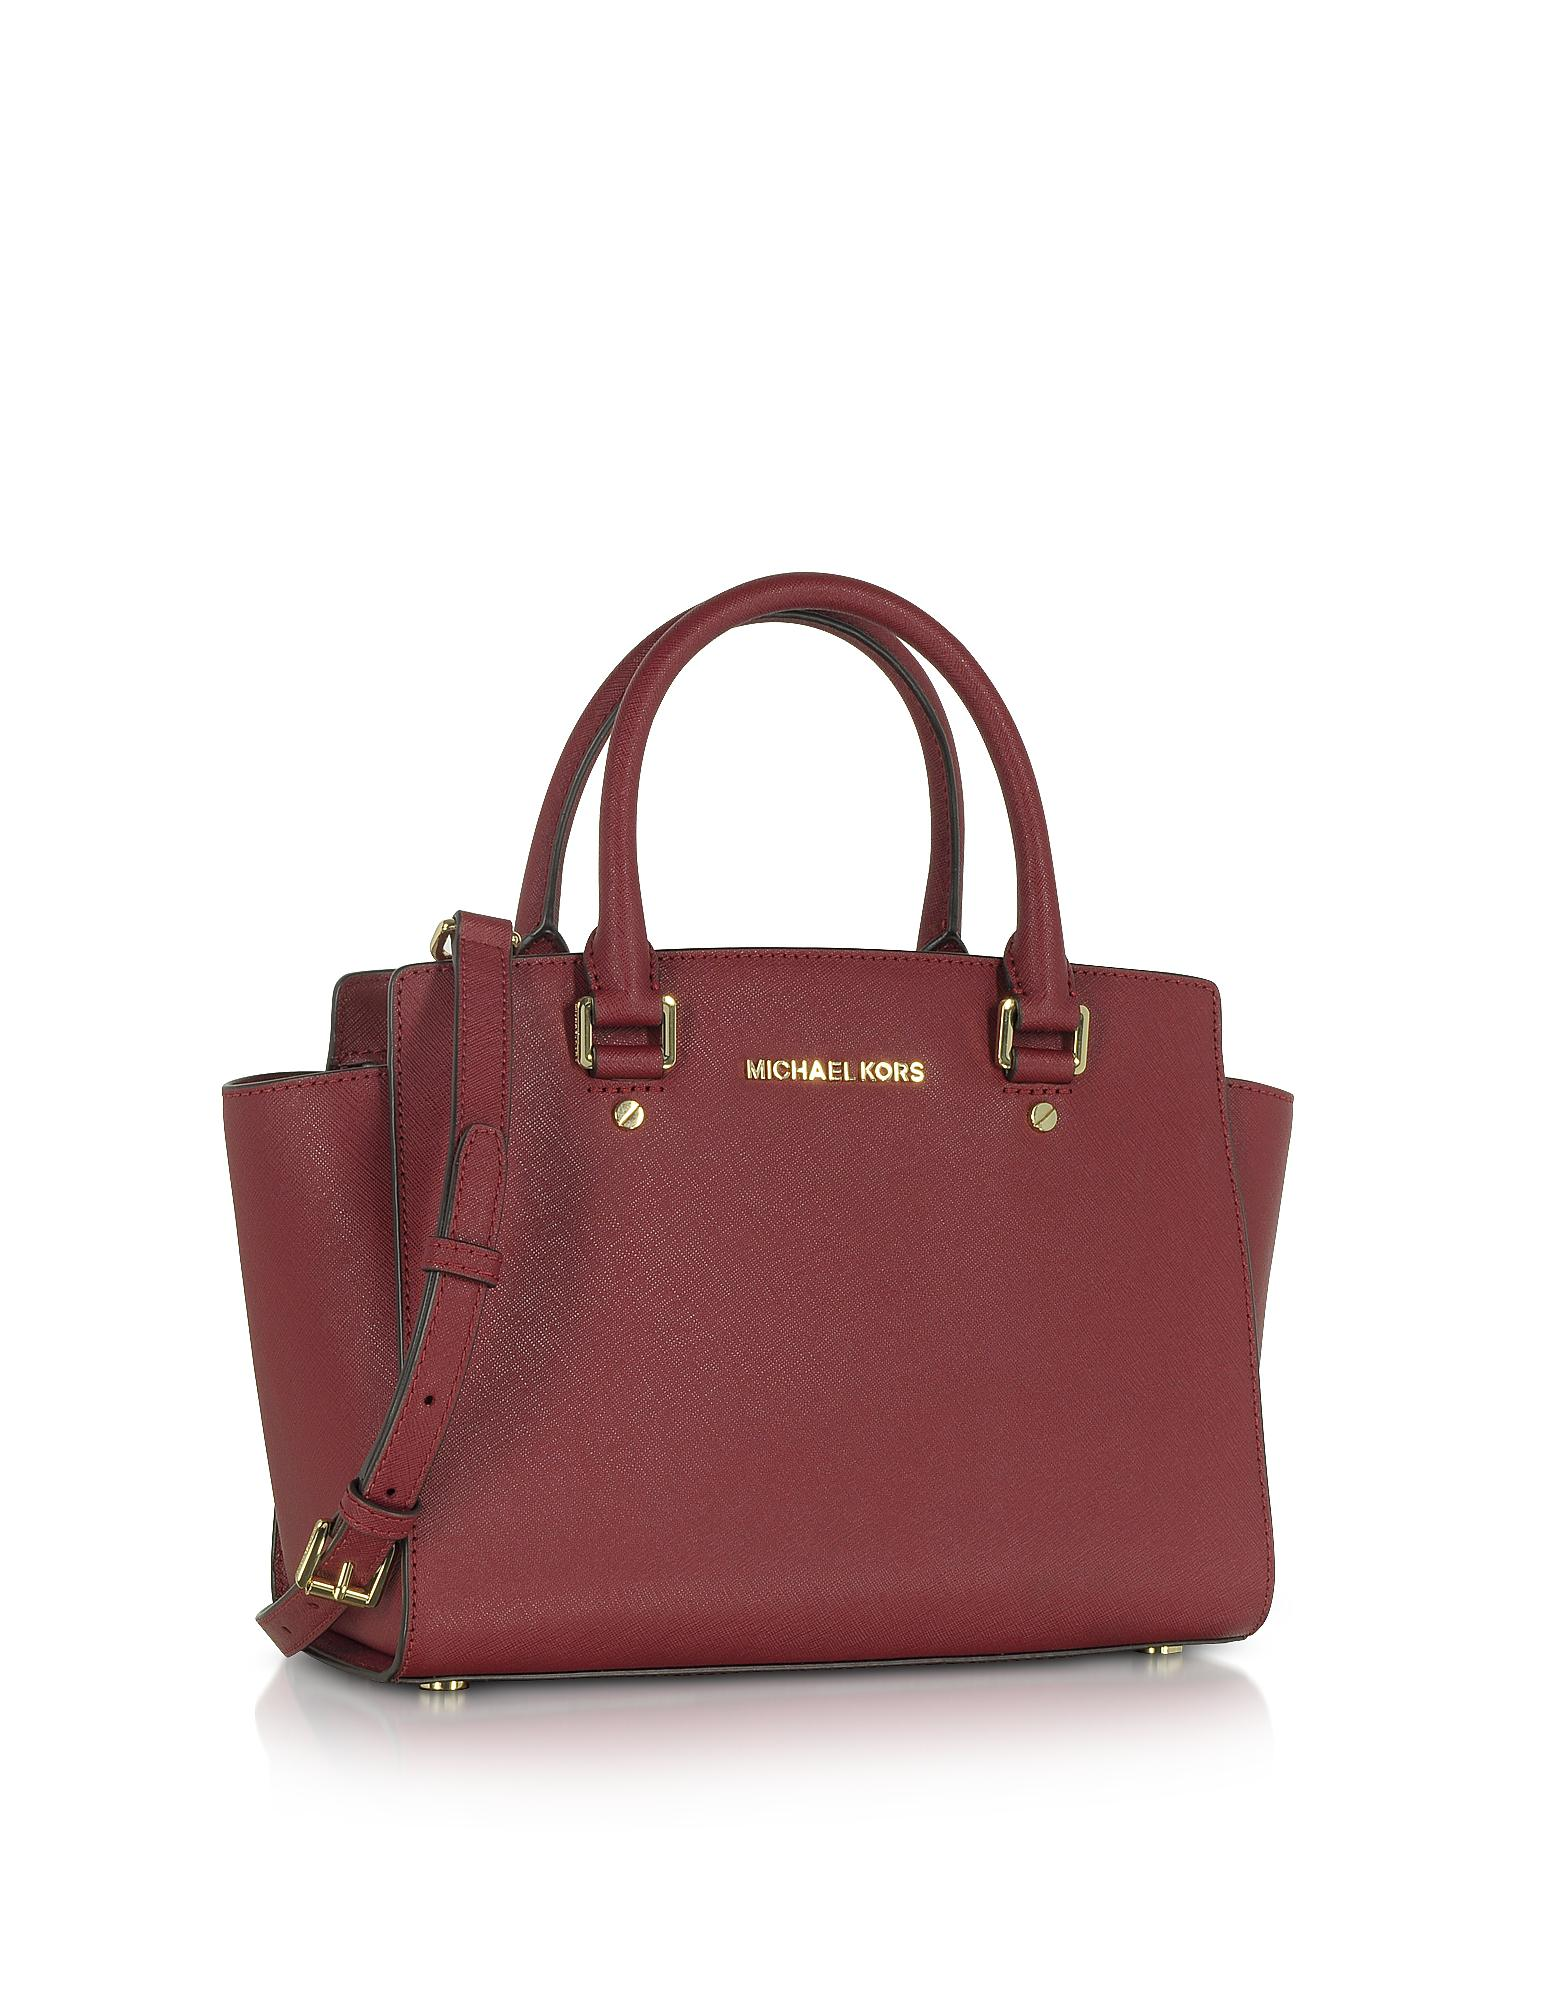 8d6e9a71c3 Michael Kors Selma Medium Mulberry Saffiano Leather Top-zip Satchel ...